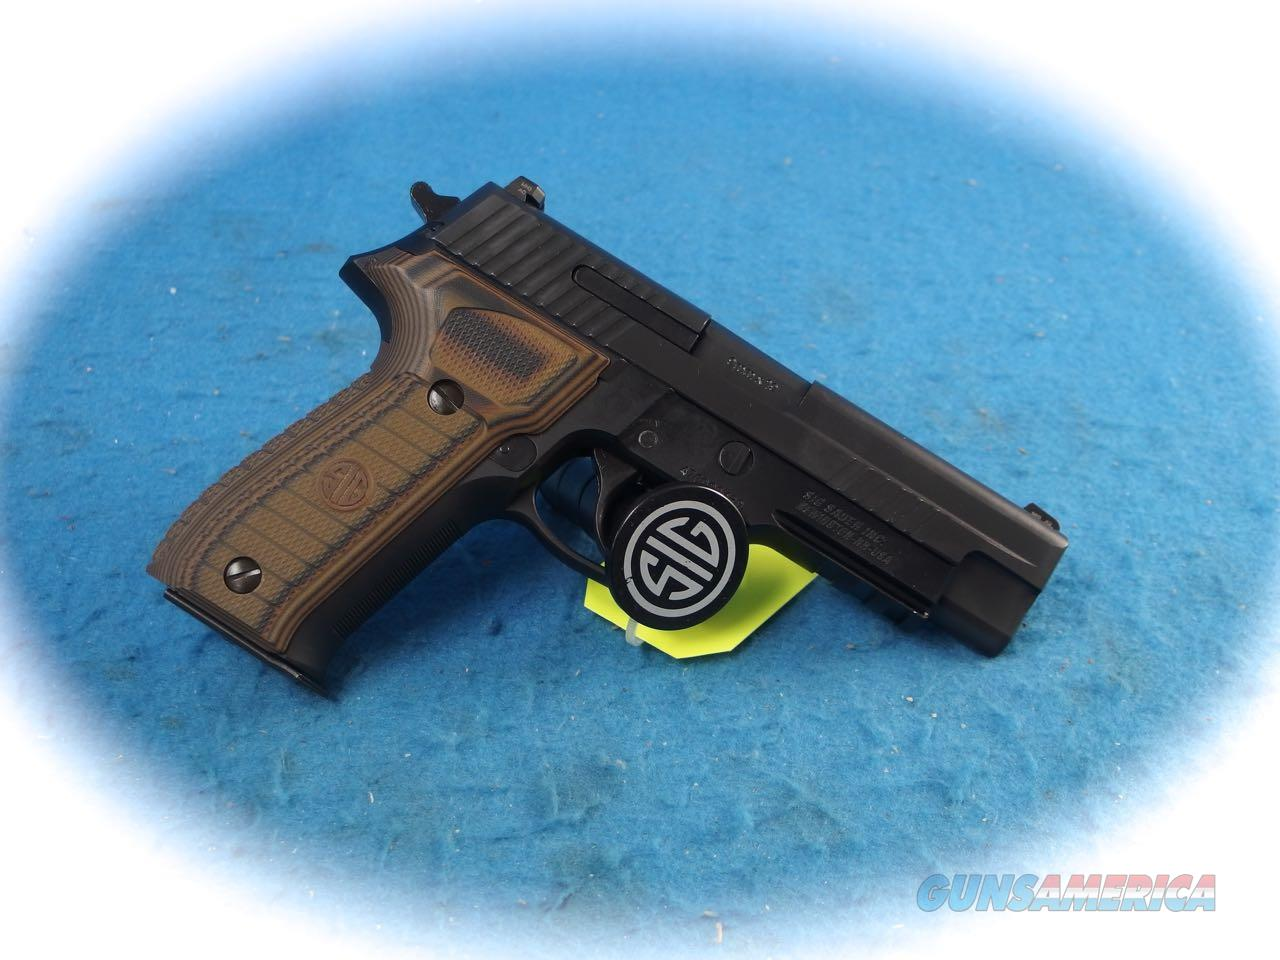 Sig Sauer P226 Select 9mm Semi Auto Pistol **New**  Guns > Pistols > Sig - Sauer/Sigarms Pistols > P226